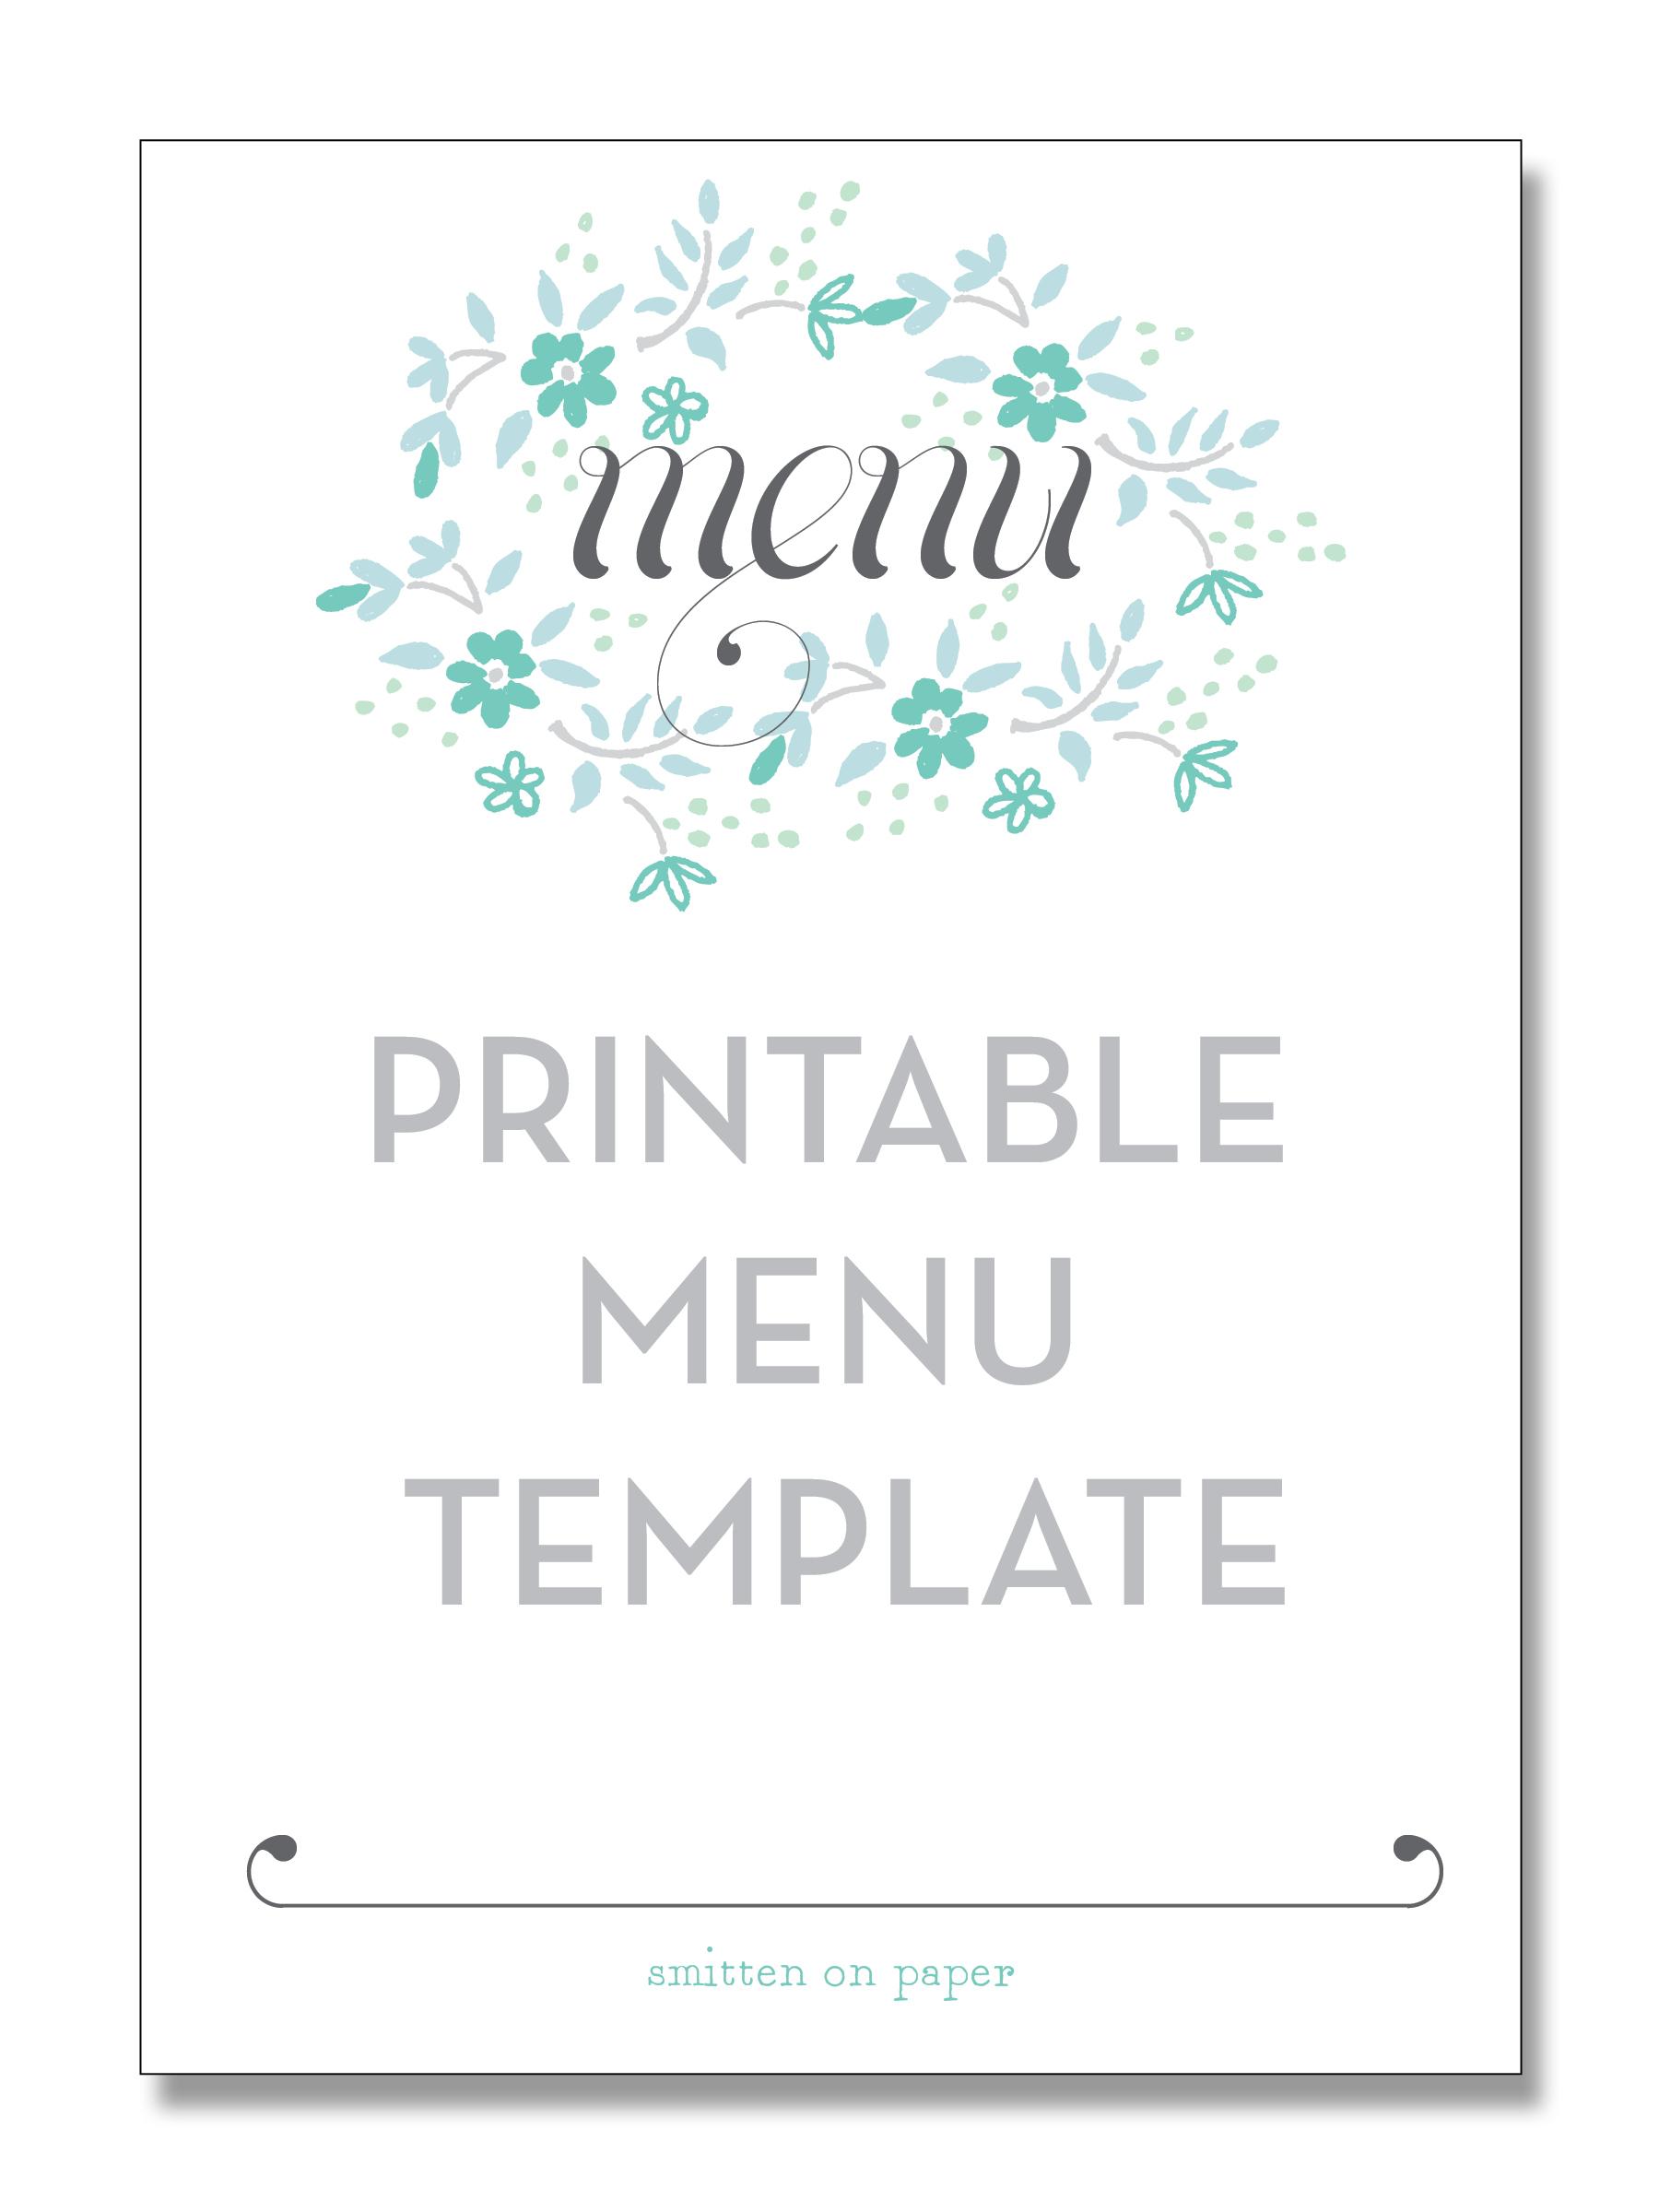 Free Printable Party Menu Templates